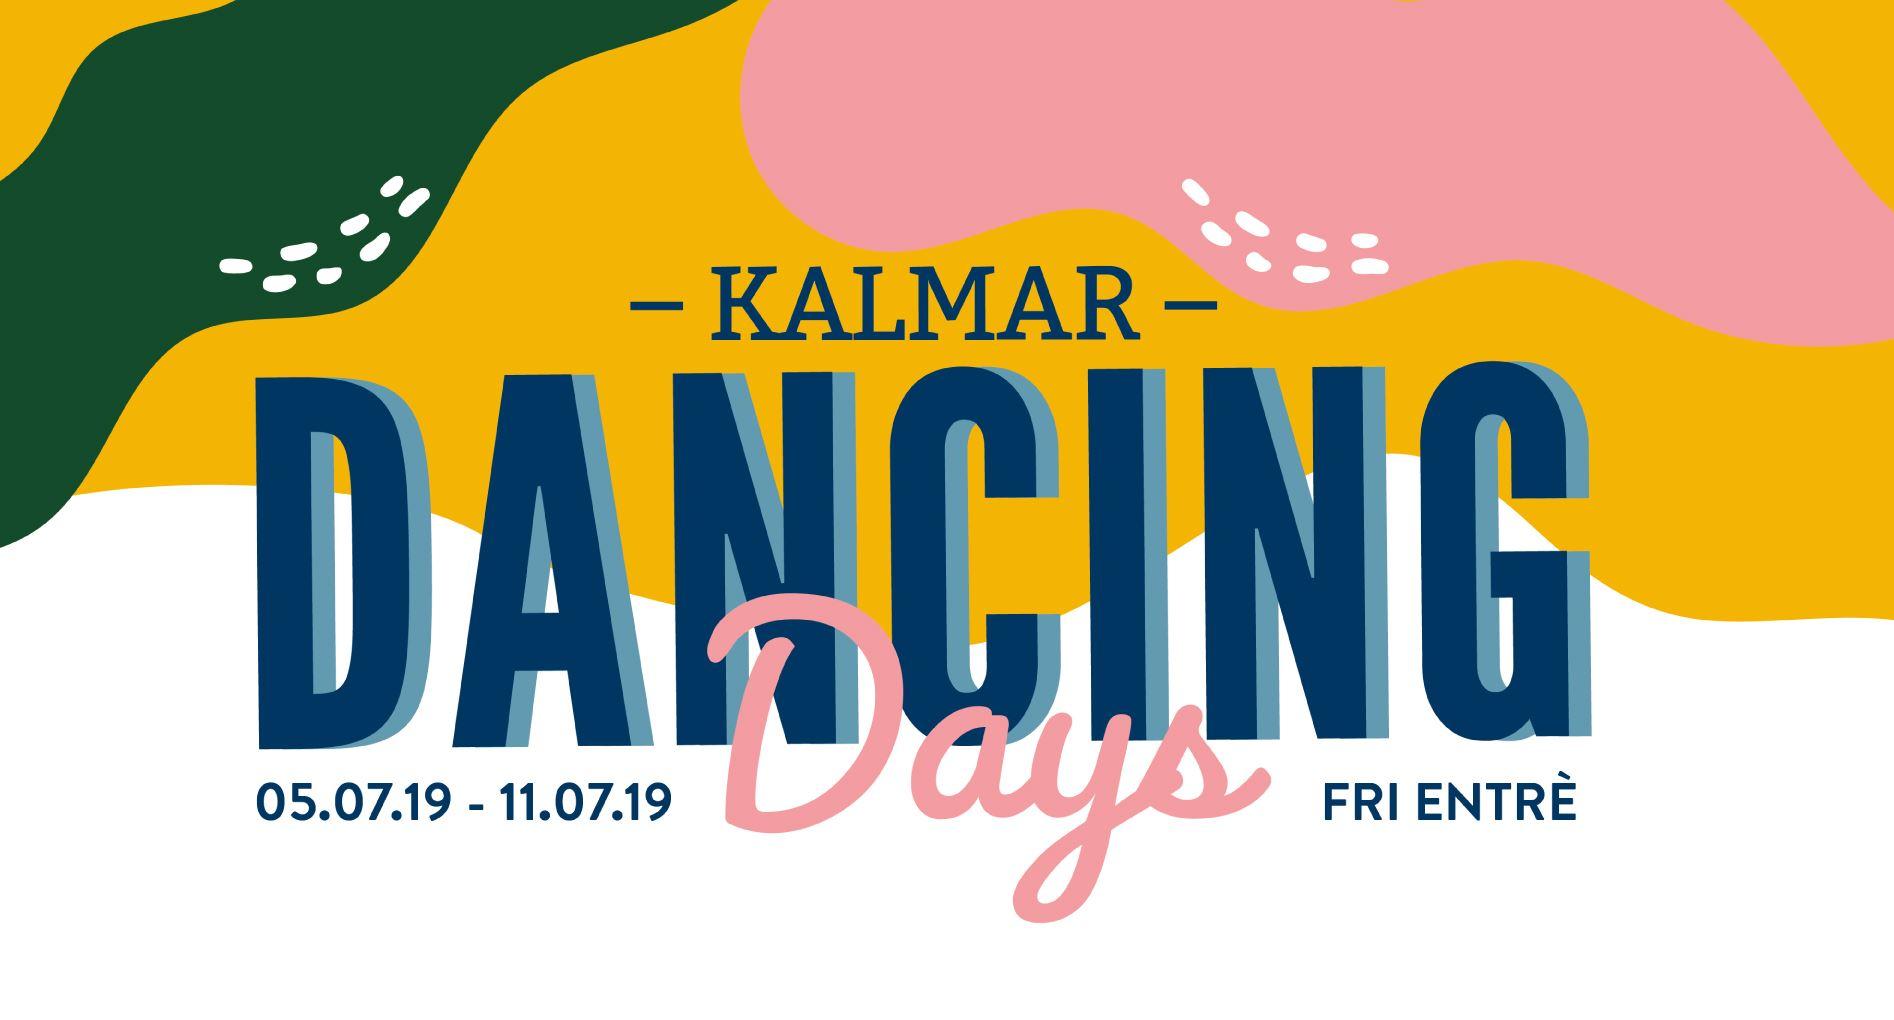 Kalmar Dancing Days